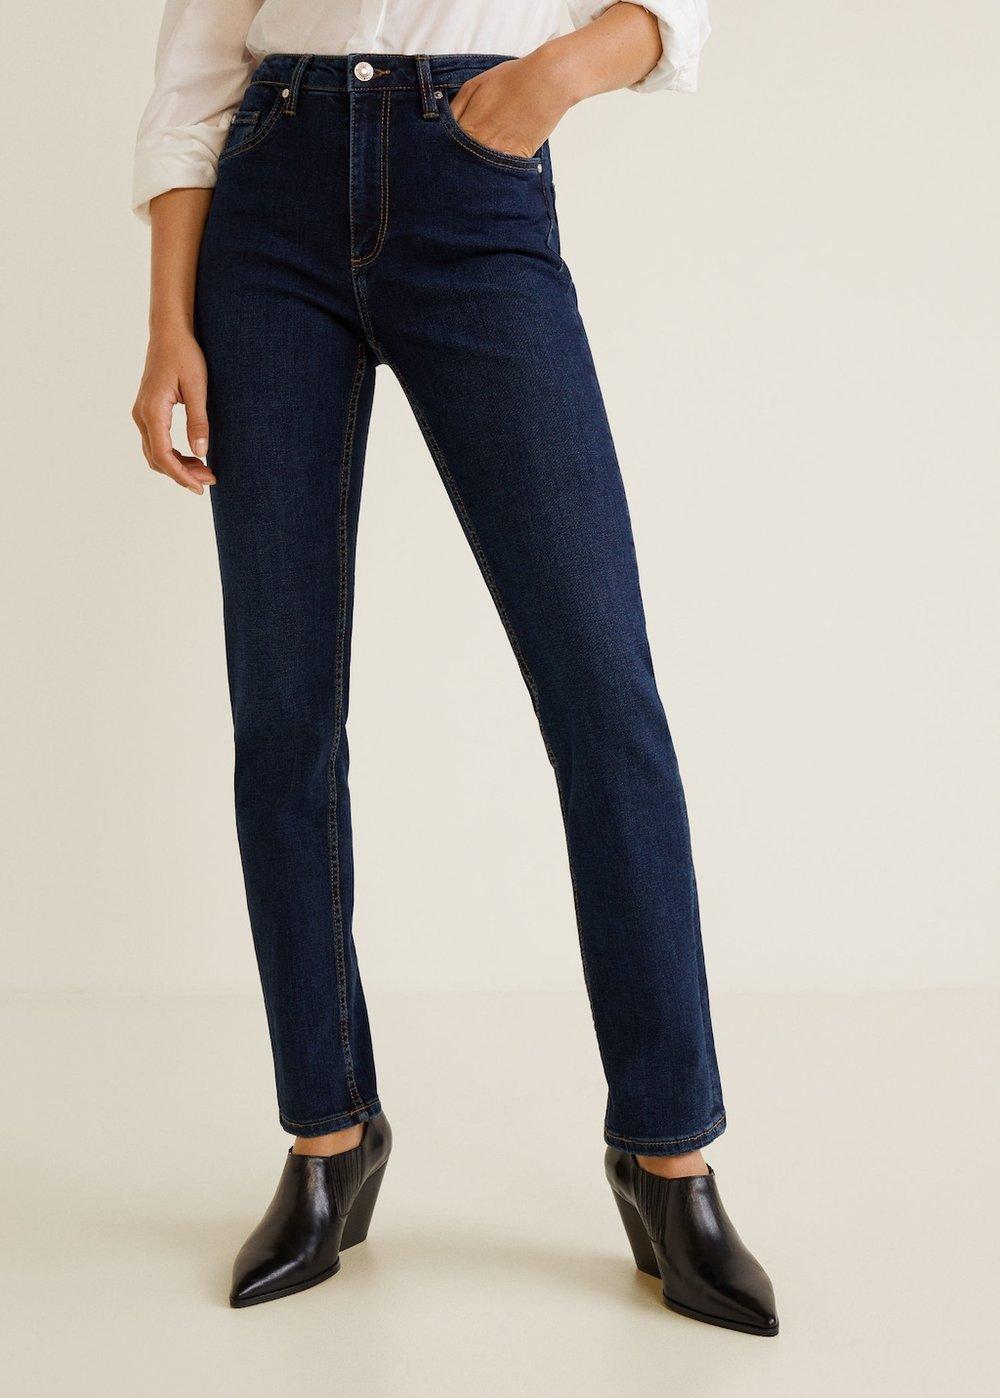 Mango Straight Jeans Anna     – $32.19